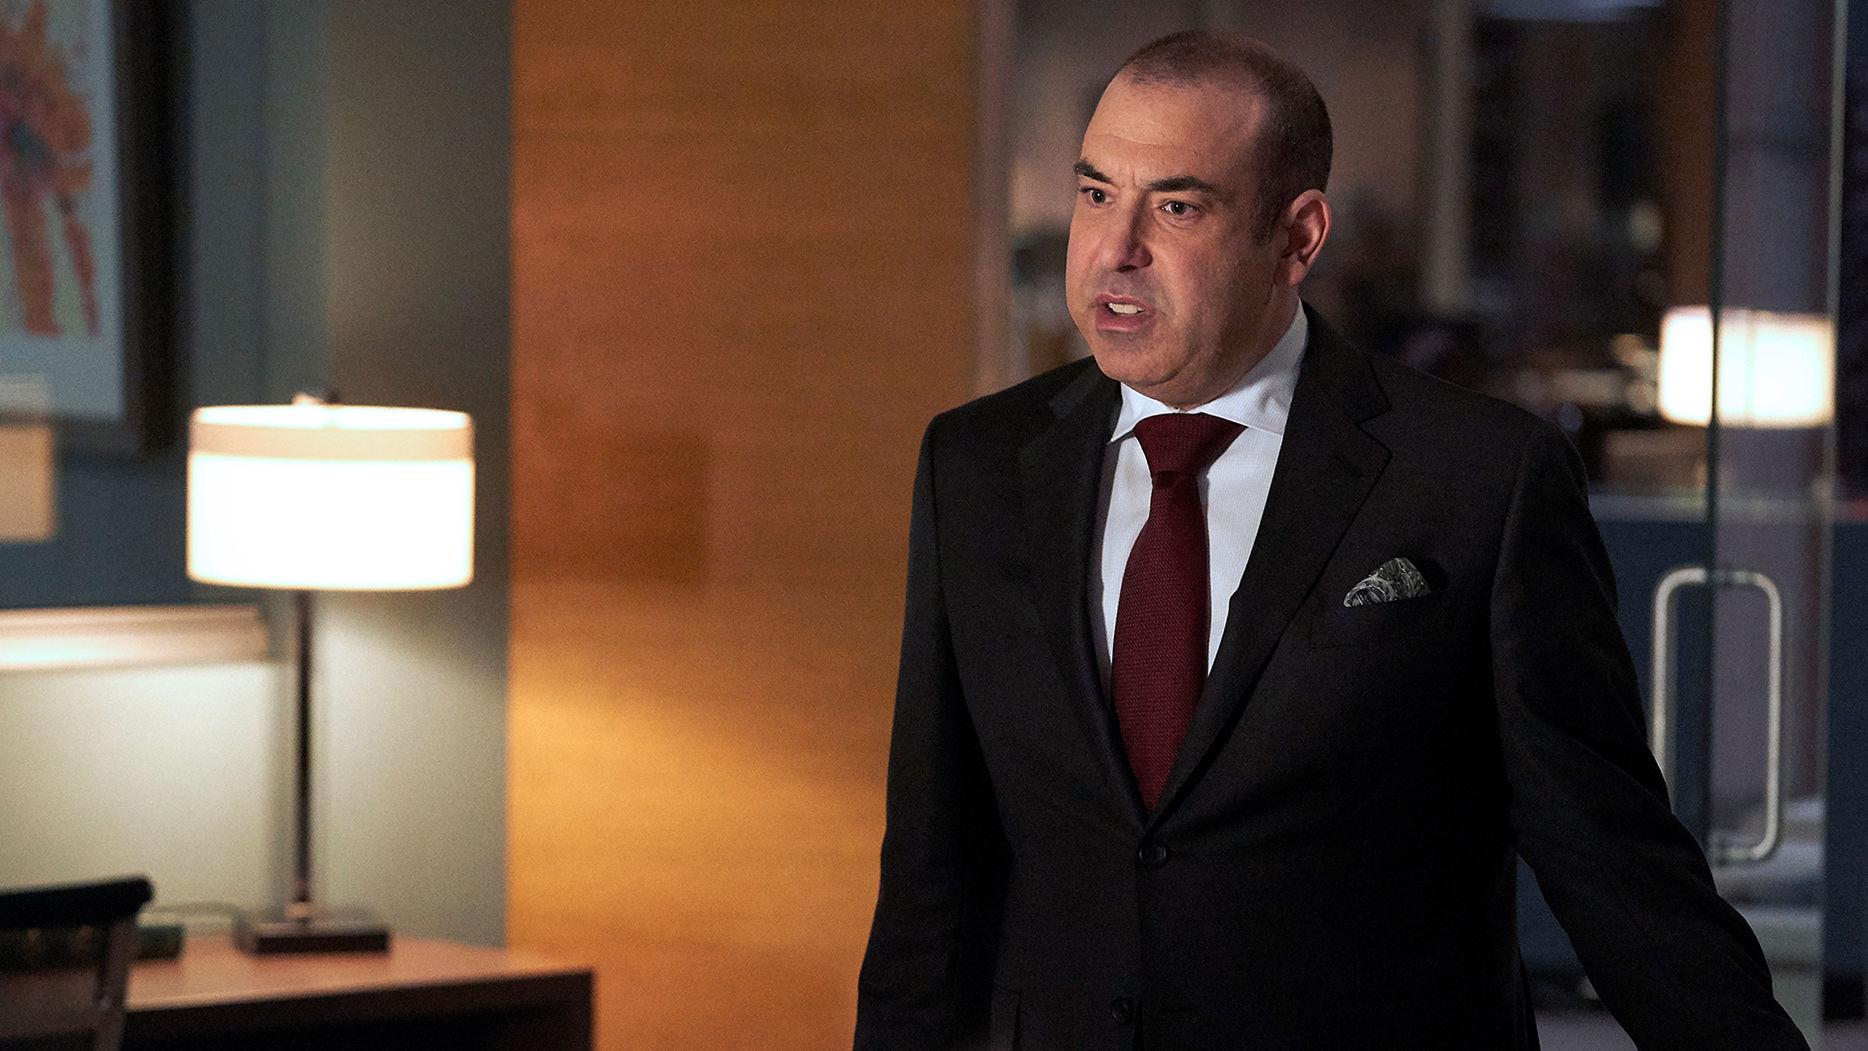 Suits Season 8 Episode 11 Review: Rocky 8 – Appocalypse